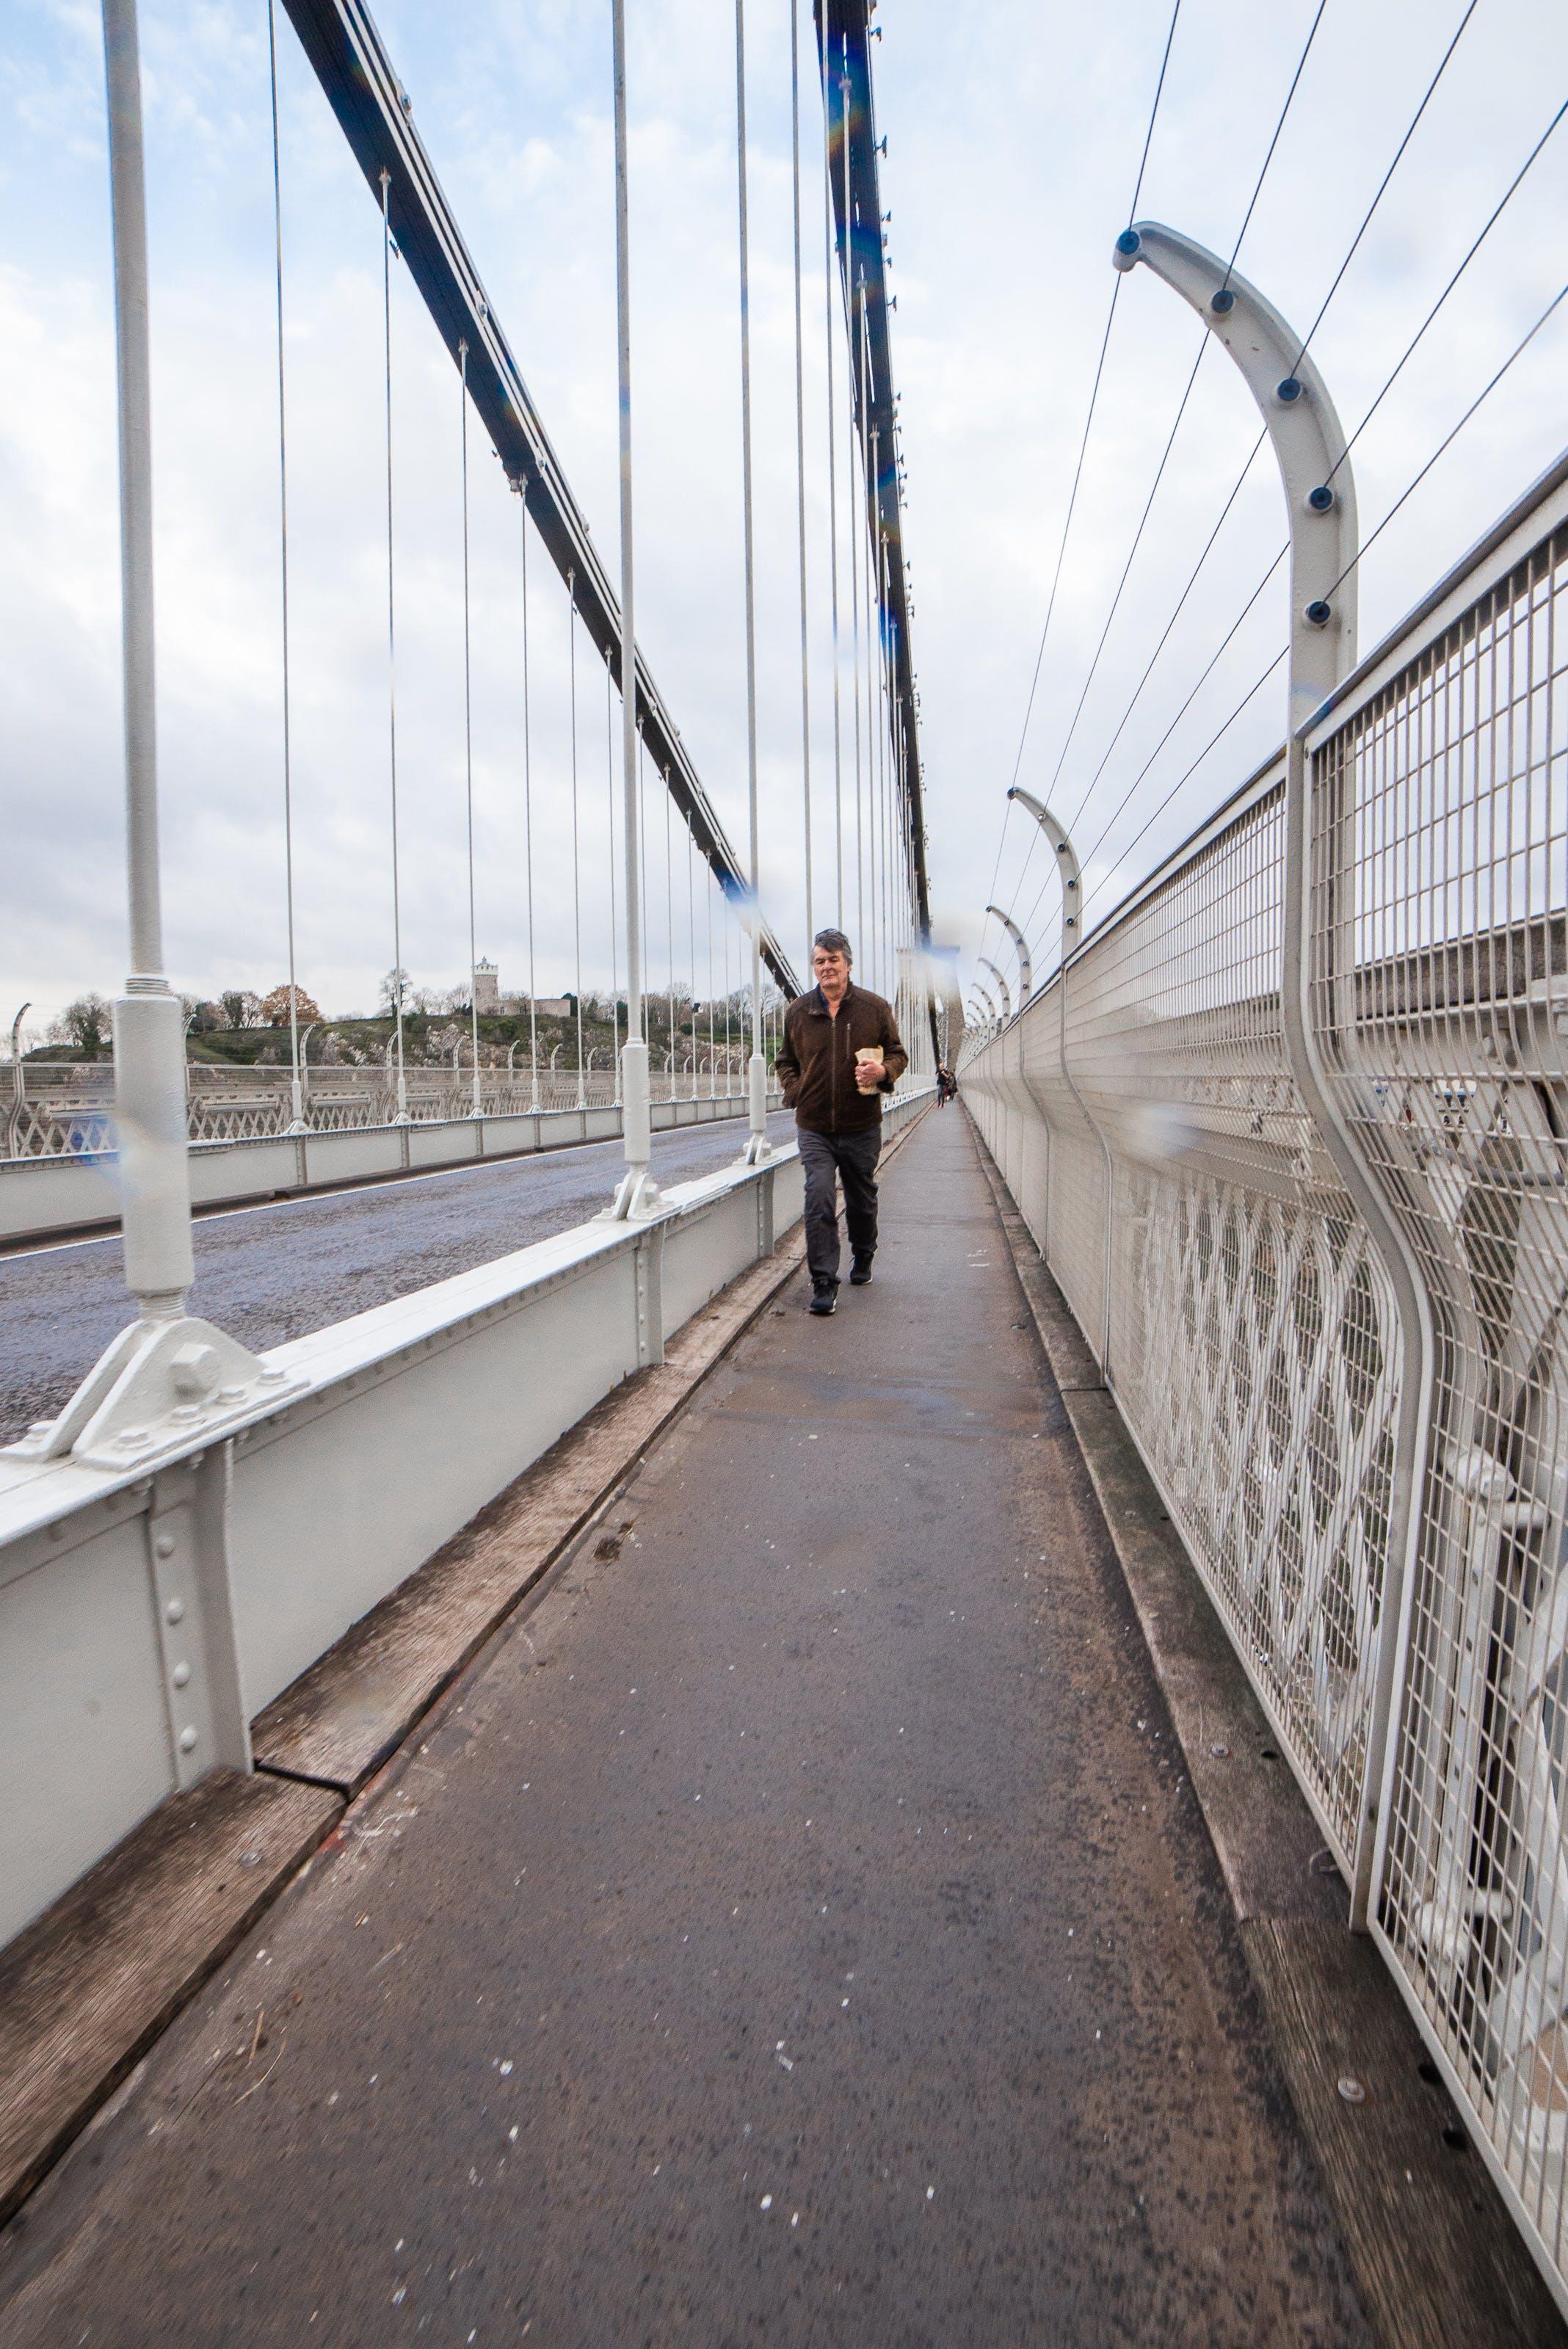 Free stock photo of blue sky, bridge, elderly man, footpath